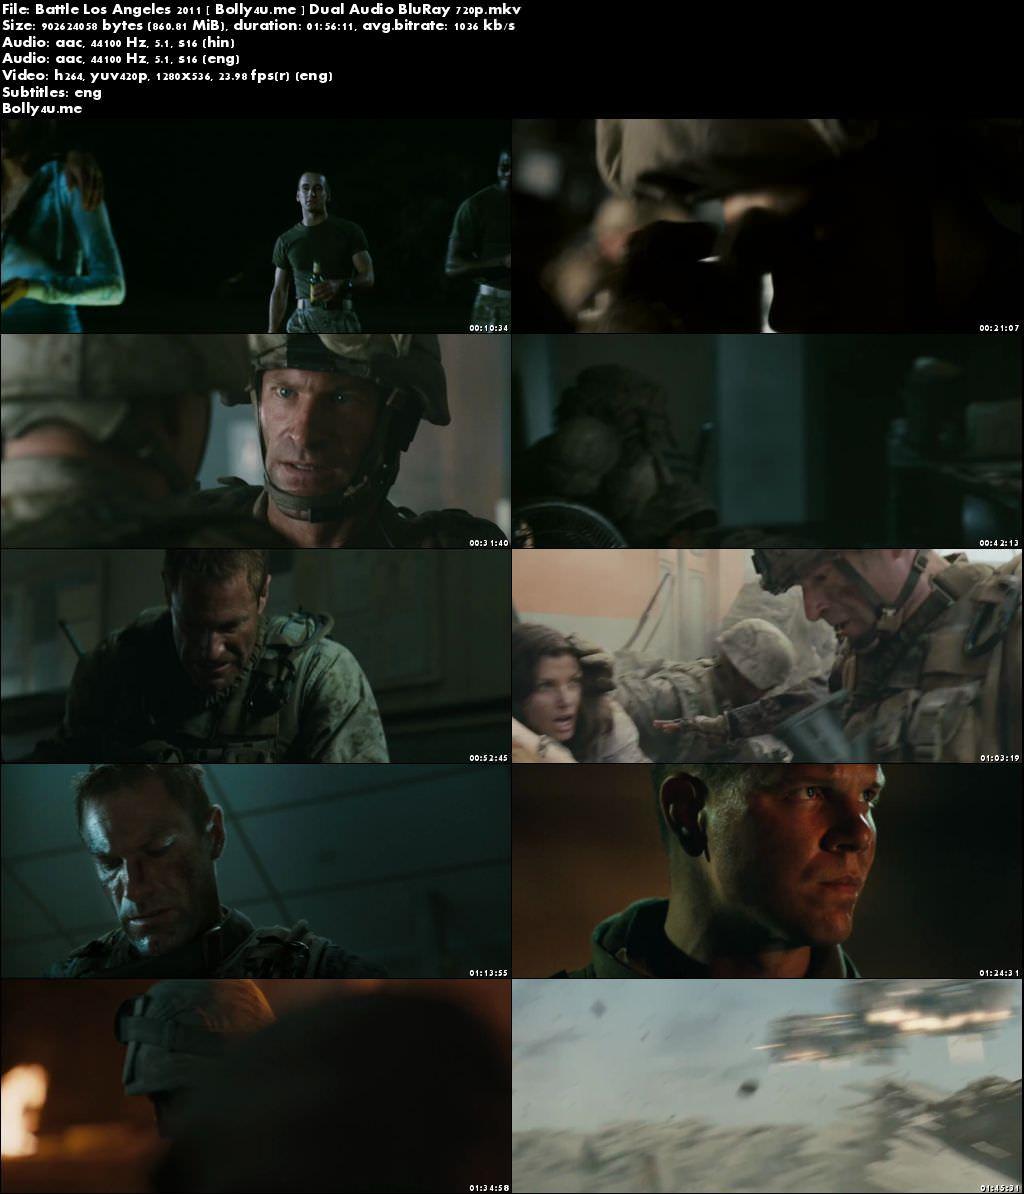 Battle Los Angeles 2011 BluRay 350MB Hindi Dual Audio 480p Download